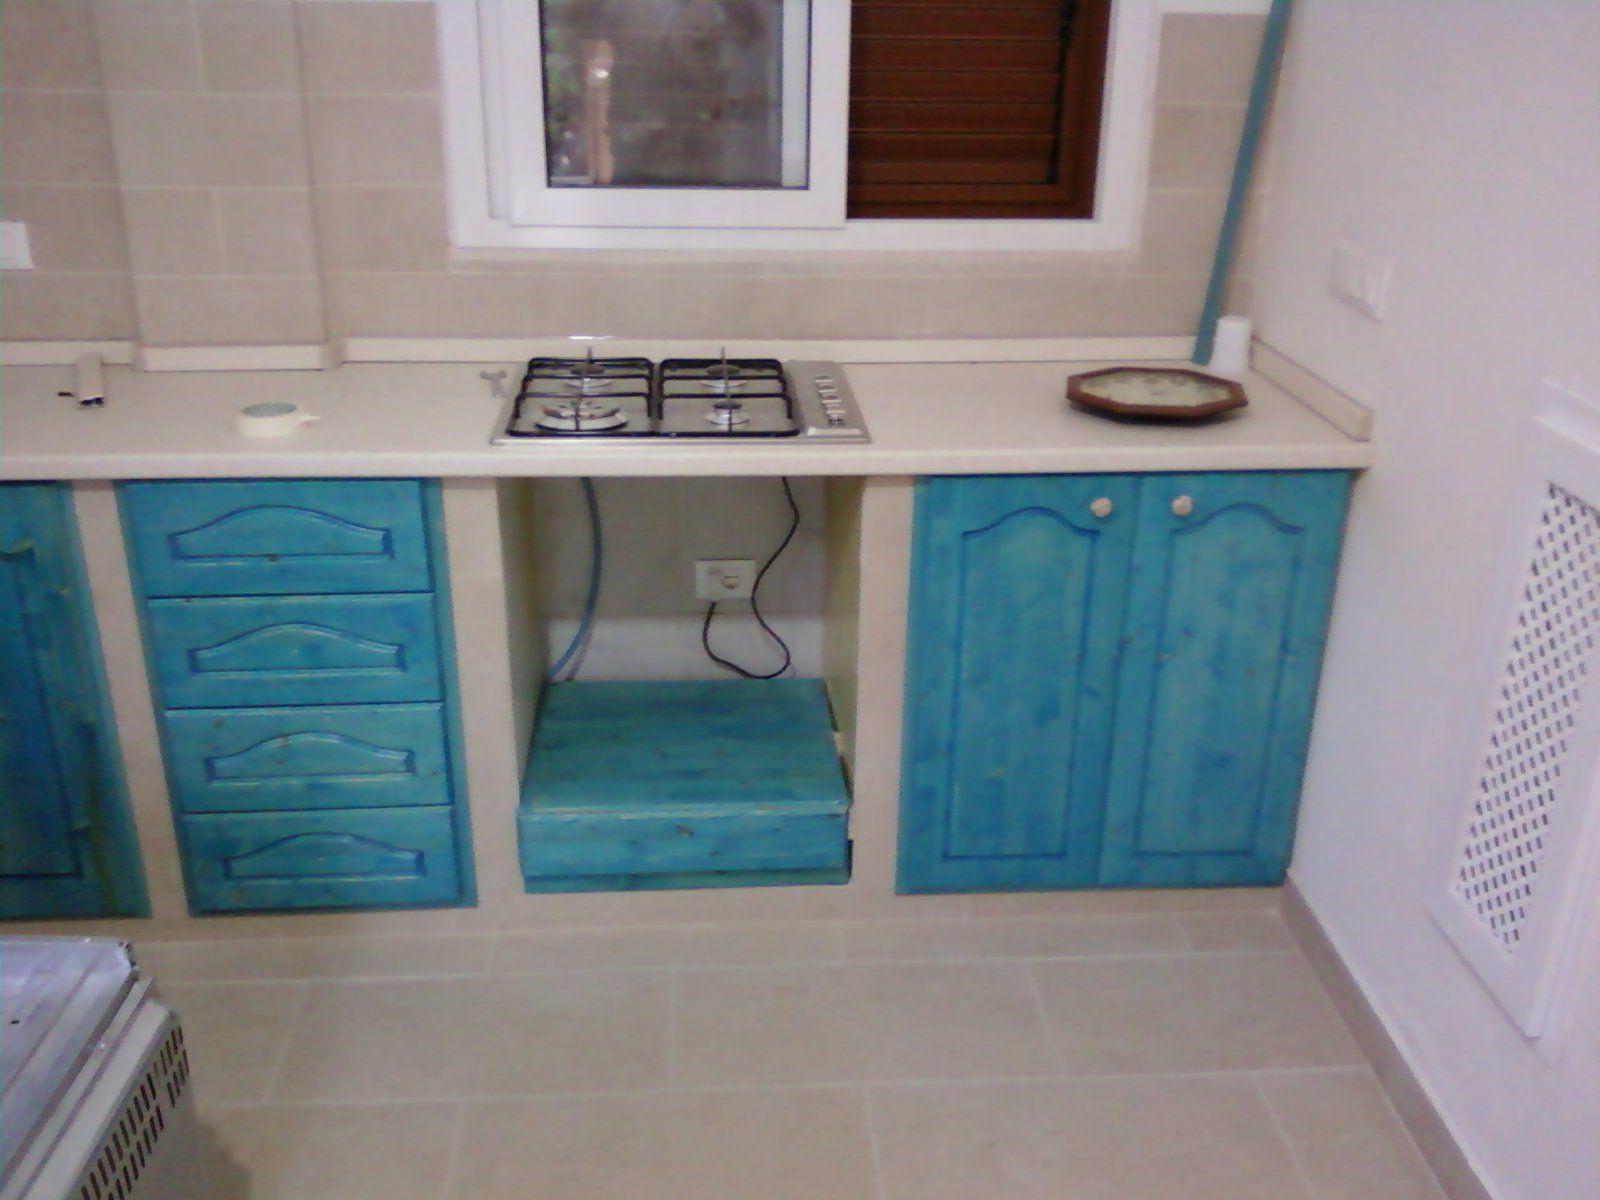 Fai da te hobby legno cucina in muratura barche nel for Decorazioni cucina fai da te